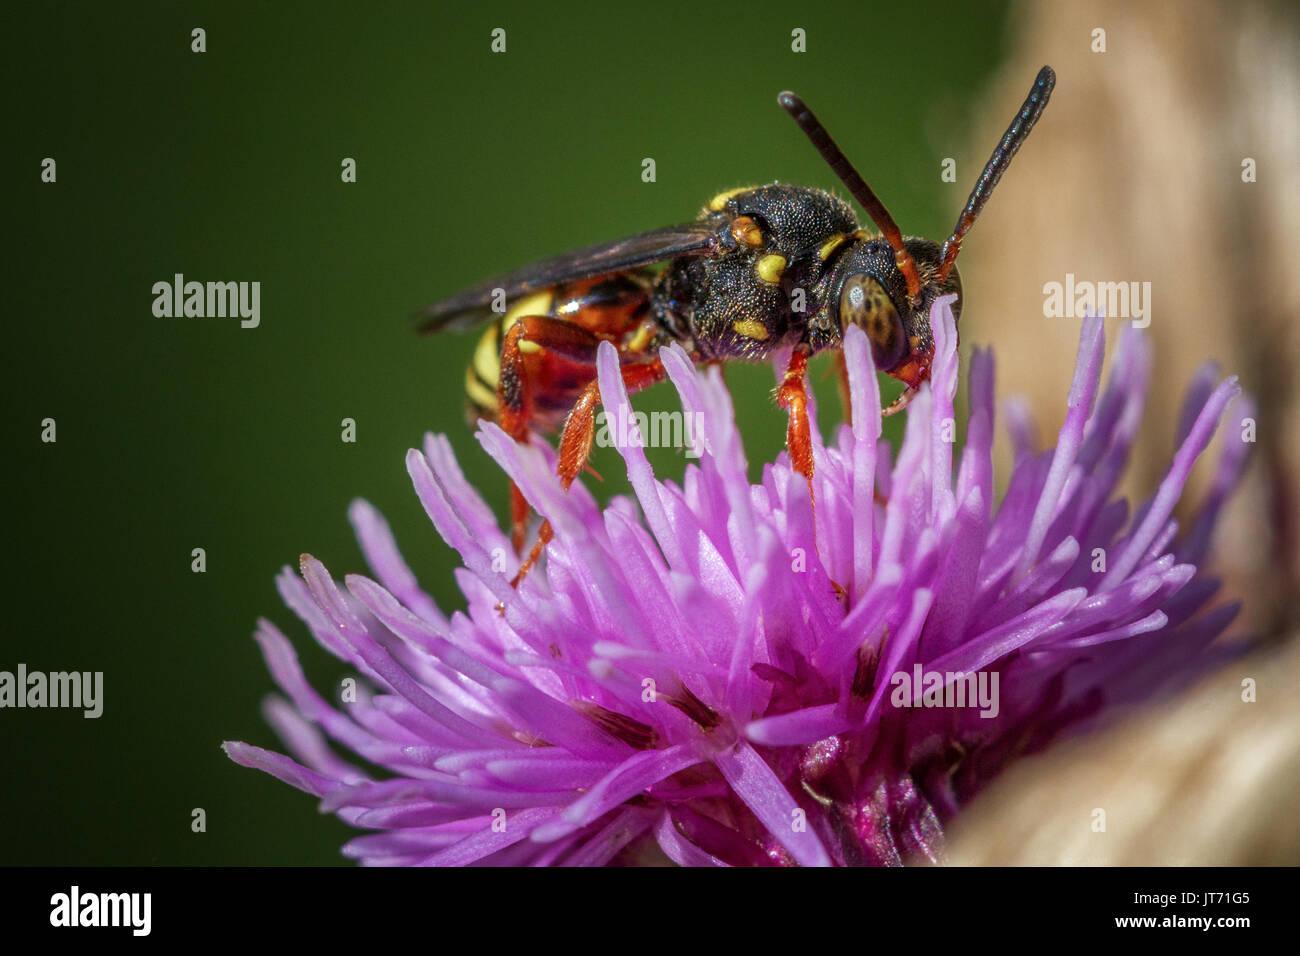 UK Wildlife: Nomada rufipes, einsame Kuckuck Biene und cleptoparastic, Burley Moor, West Yorkshire, England Stockbild